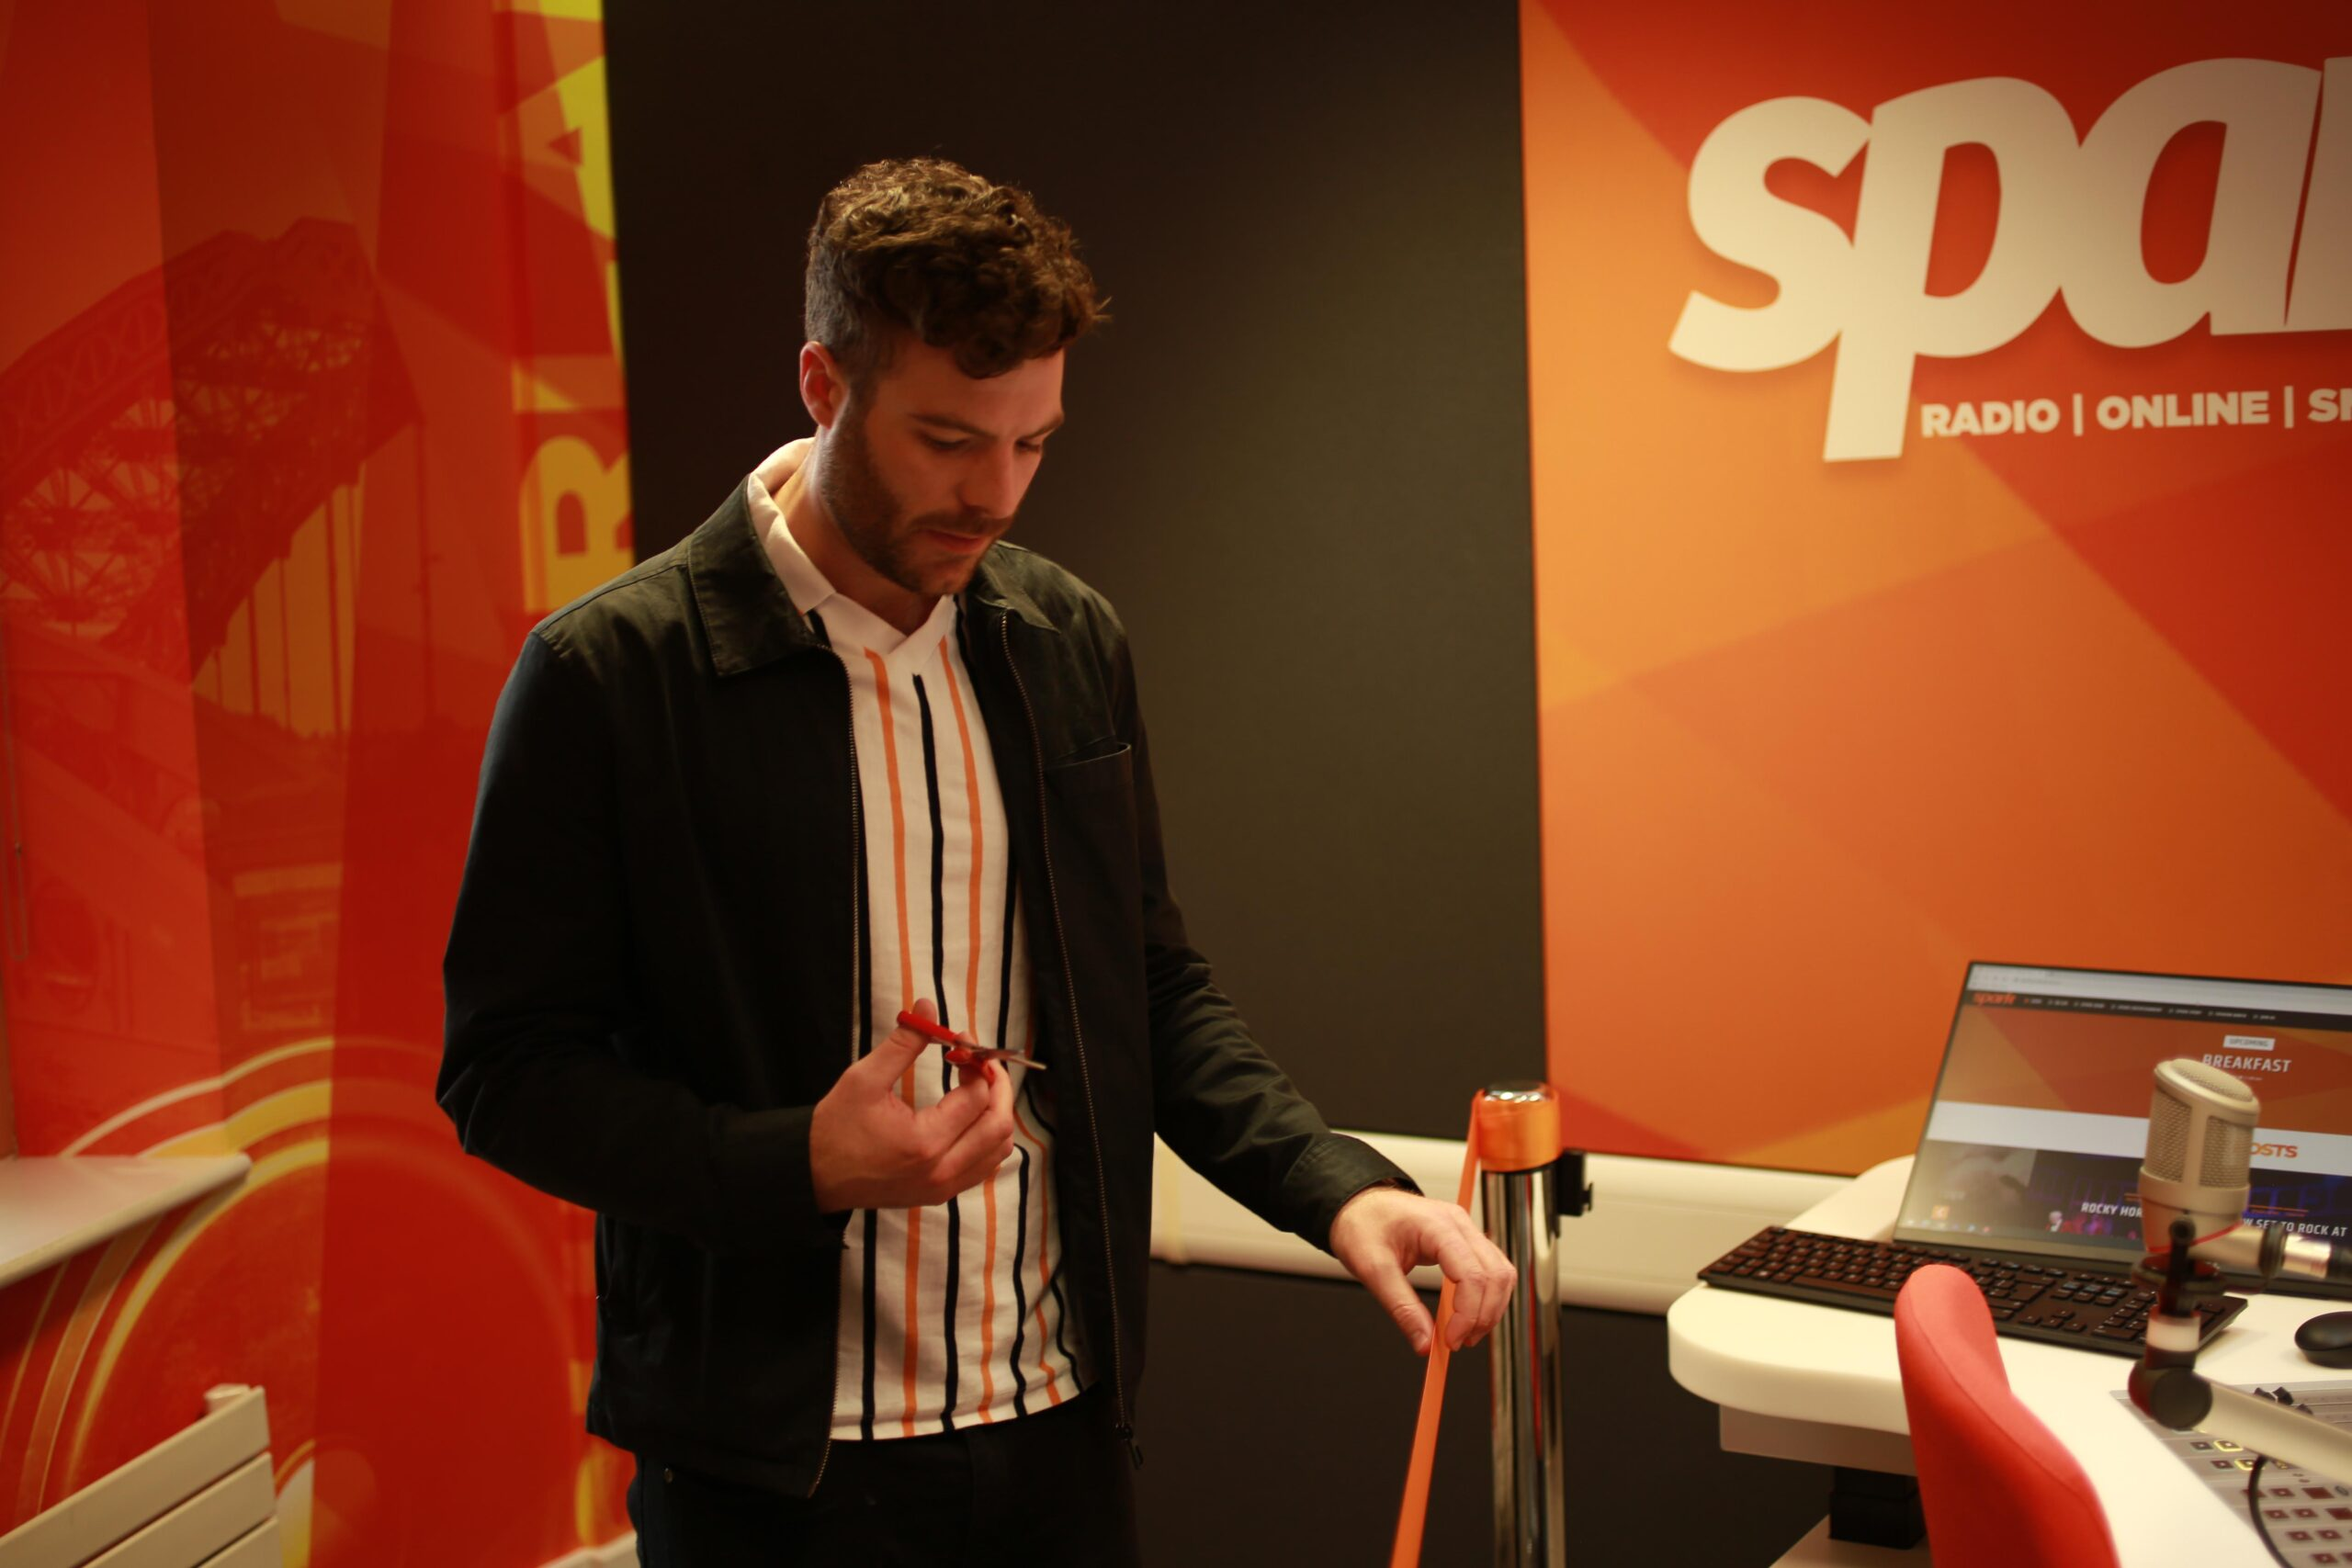 Jordan heads North to officially open Spark Radio's new studio